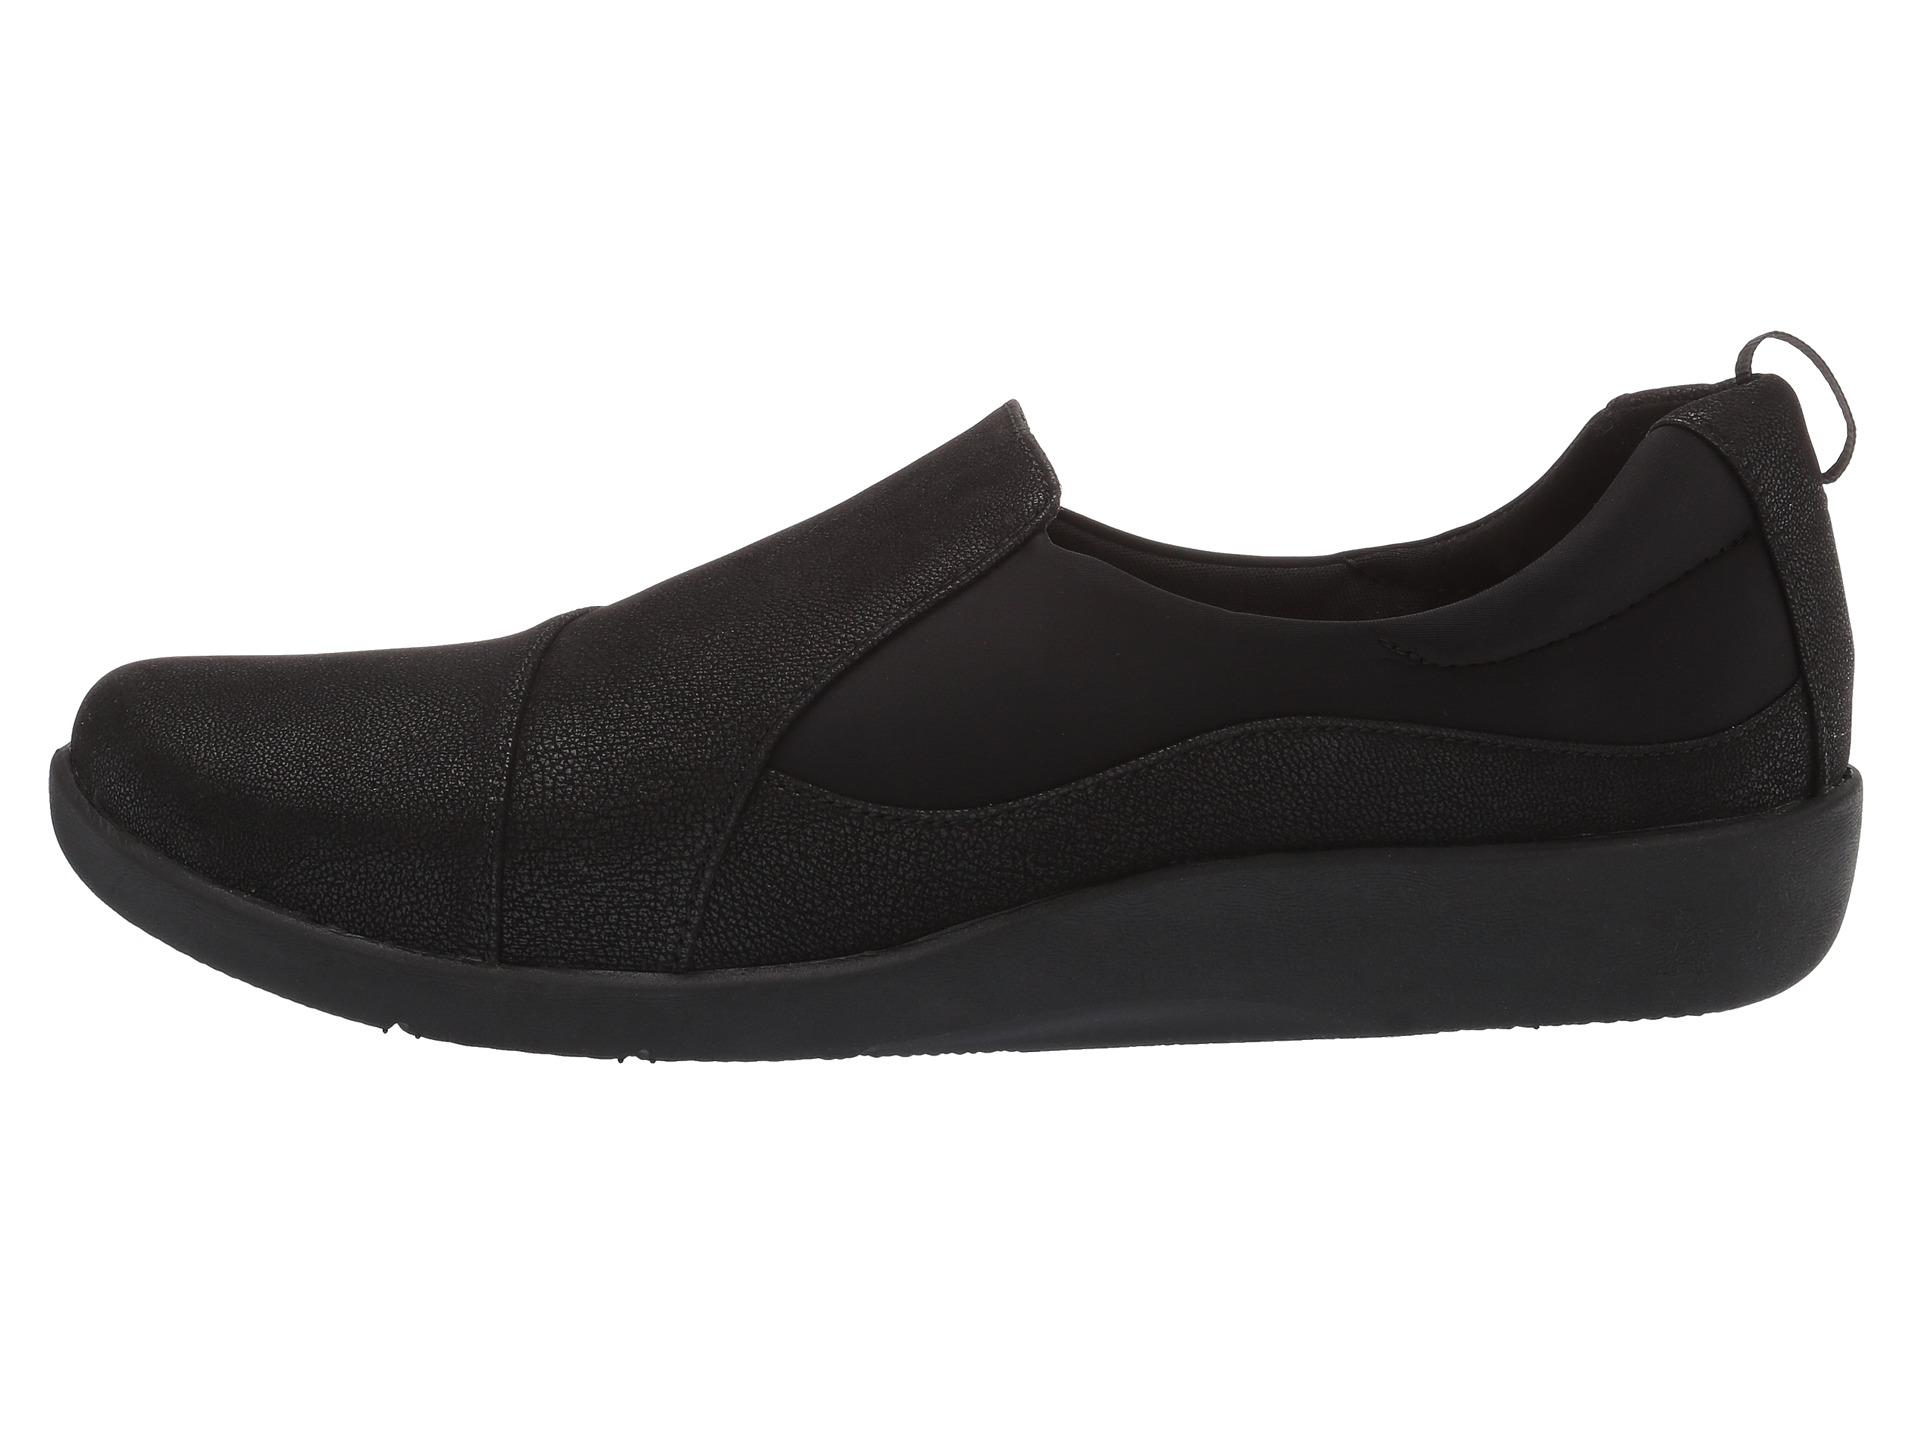 Clarks Sillian Paz Slip On Shoes Reviews